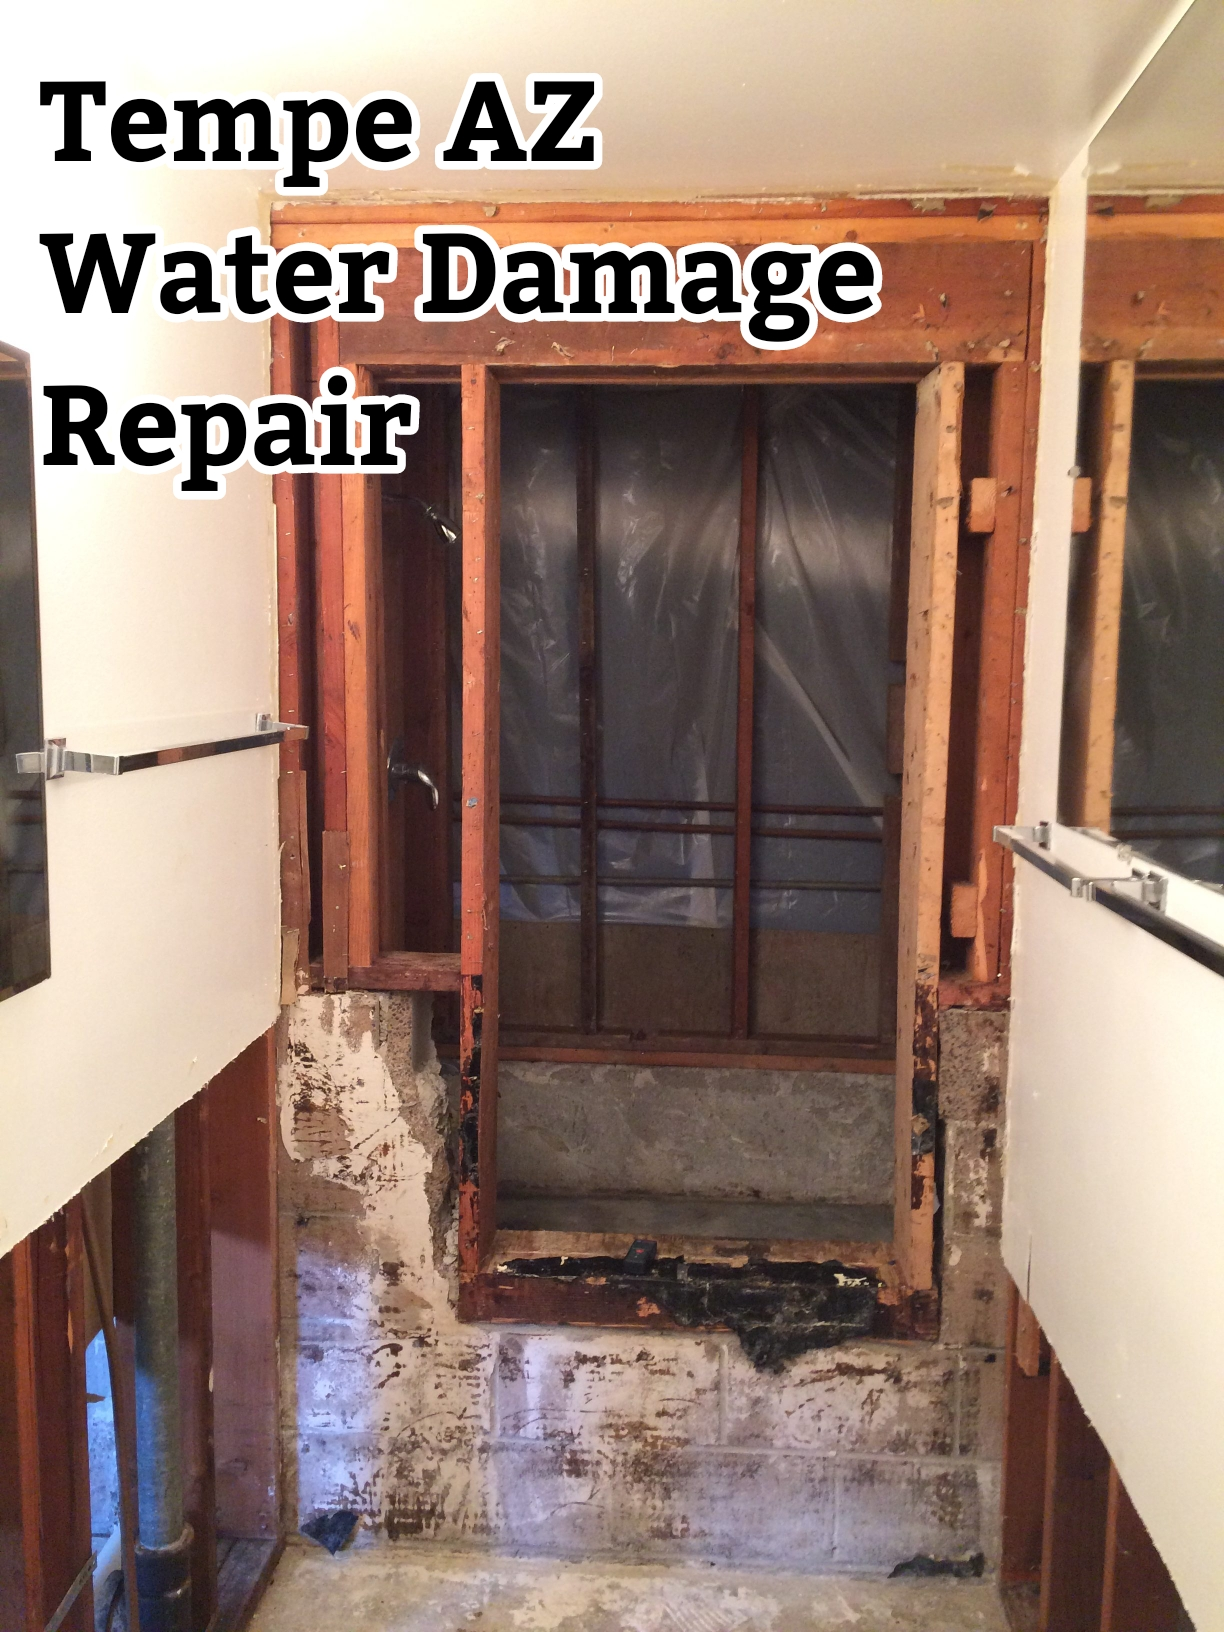 Tempe AZ Water Damage Repair